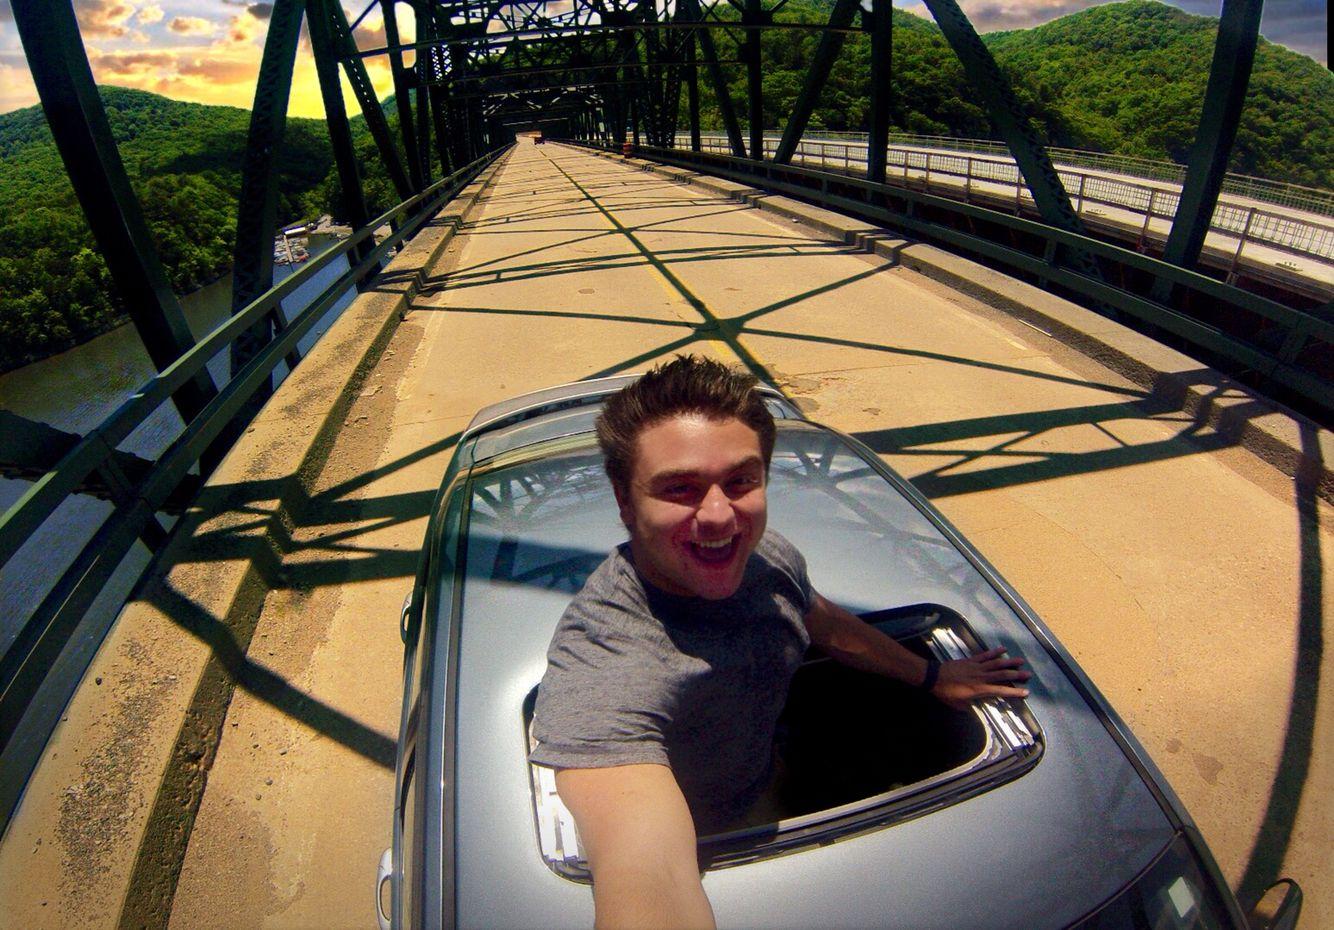 Gopro bridge car selfie